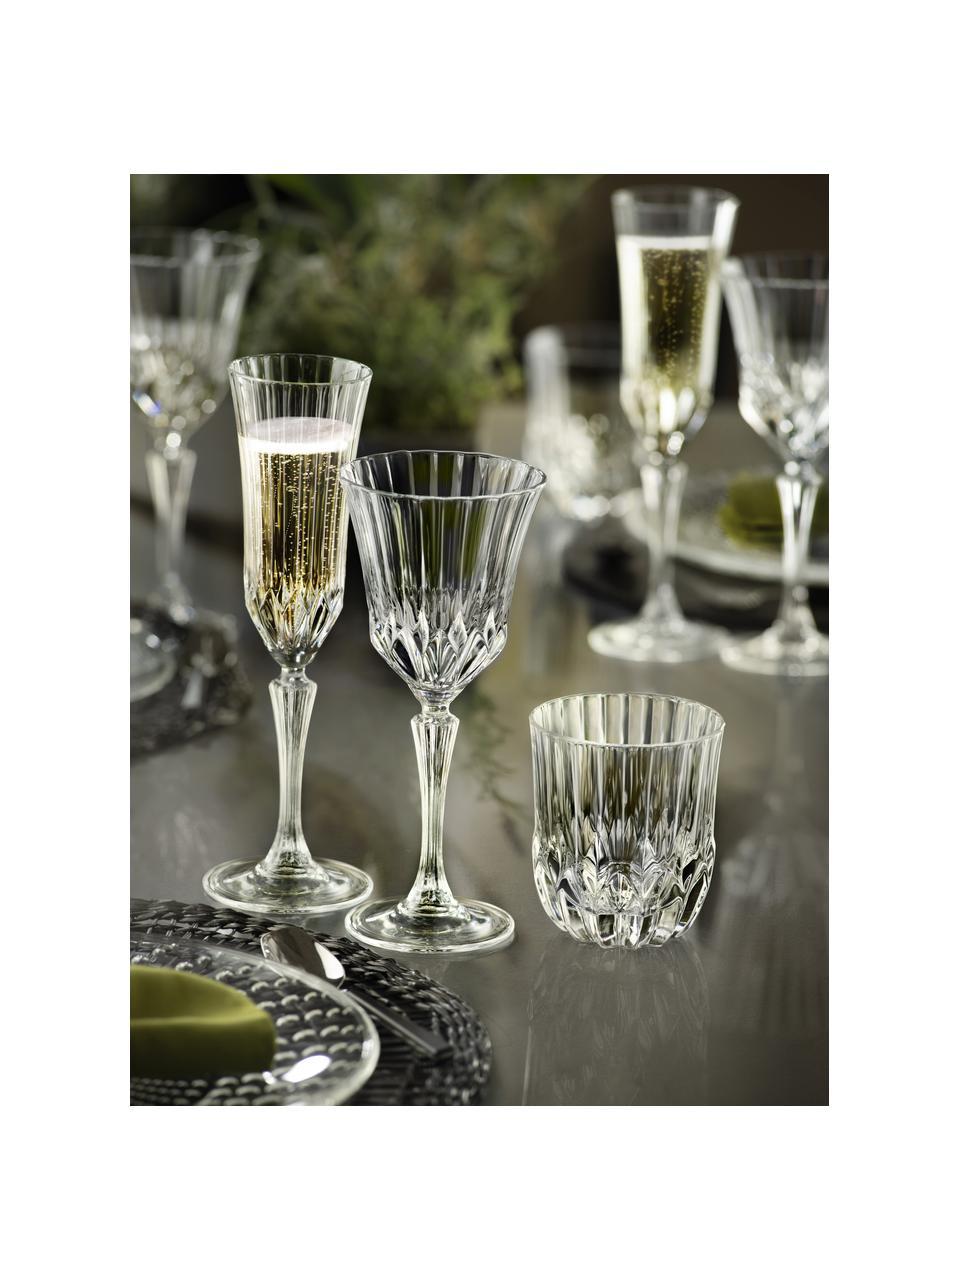 Vasos old fashioned de cristal Adagio, 6uds., Cristal, Transparente, Ø 9 x Al 10 cm. 350 ml